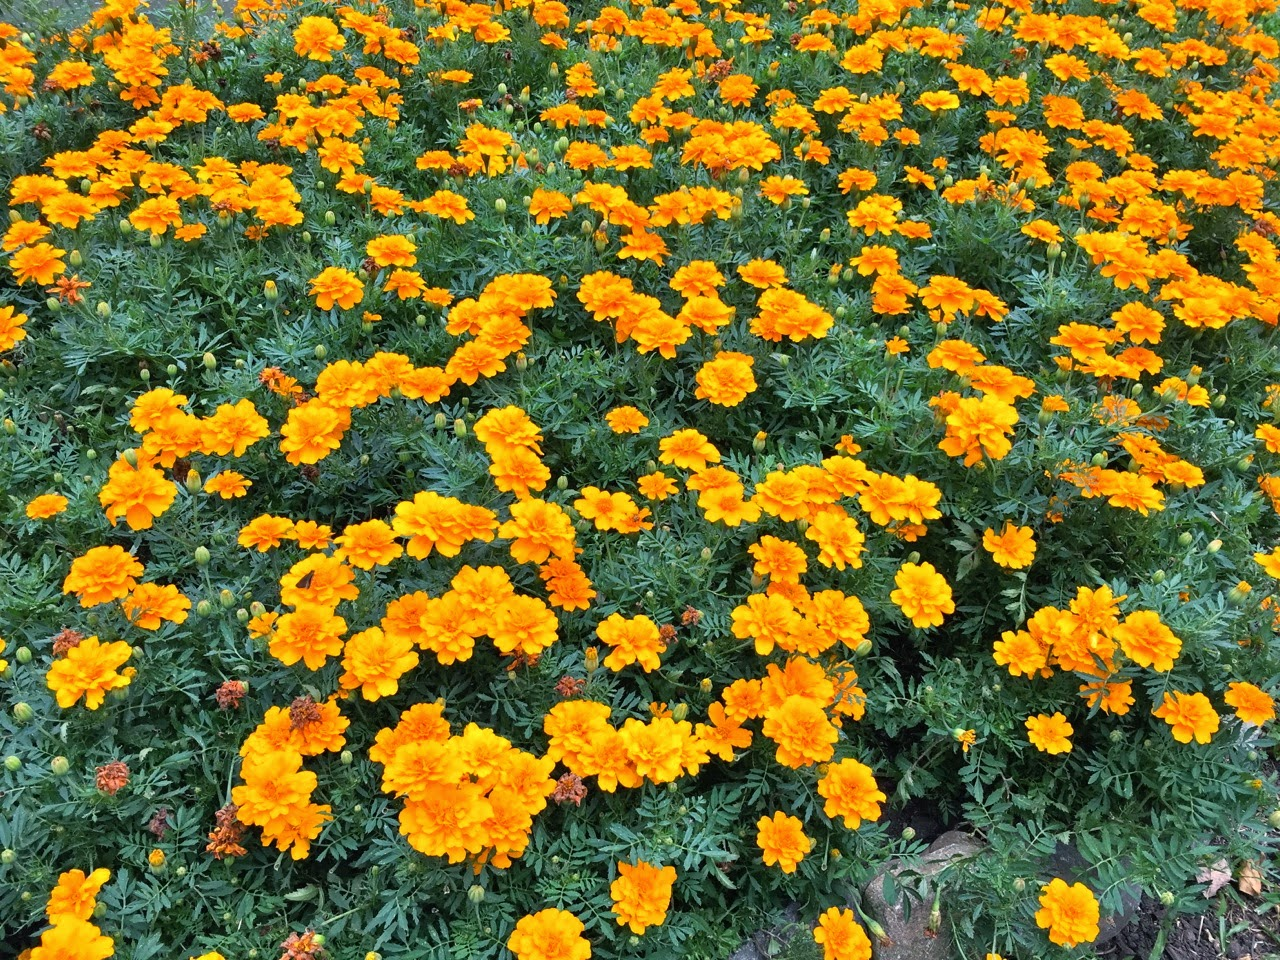 Jardim Botânico Francisca Maria Garfunkel - Curitiba (PR) flores